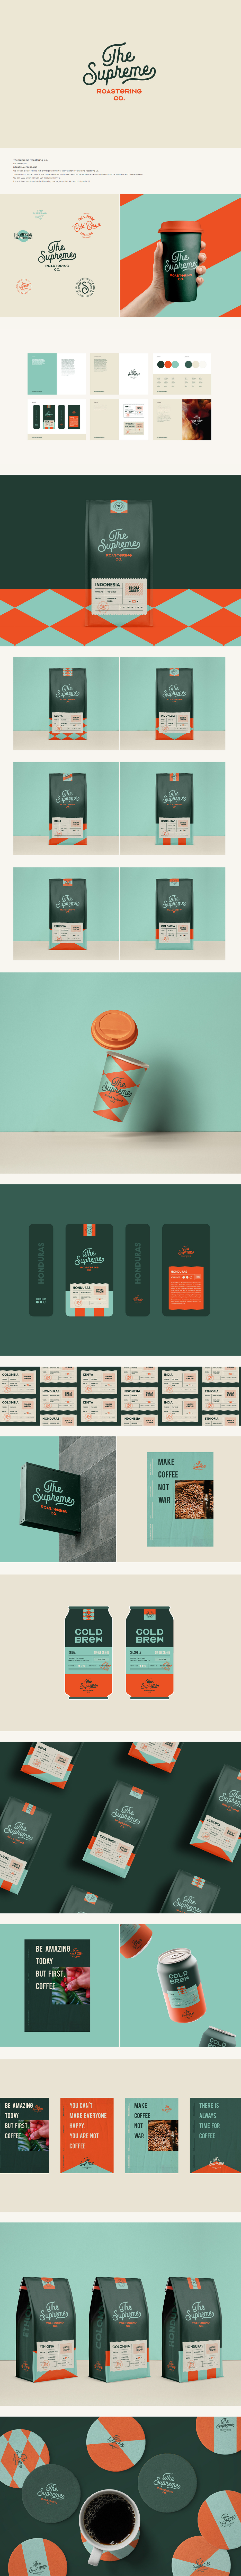 Branding,Packaging,Graphic Design